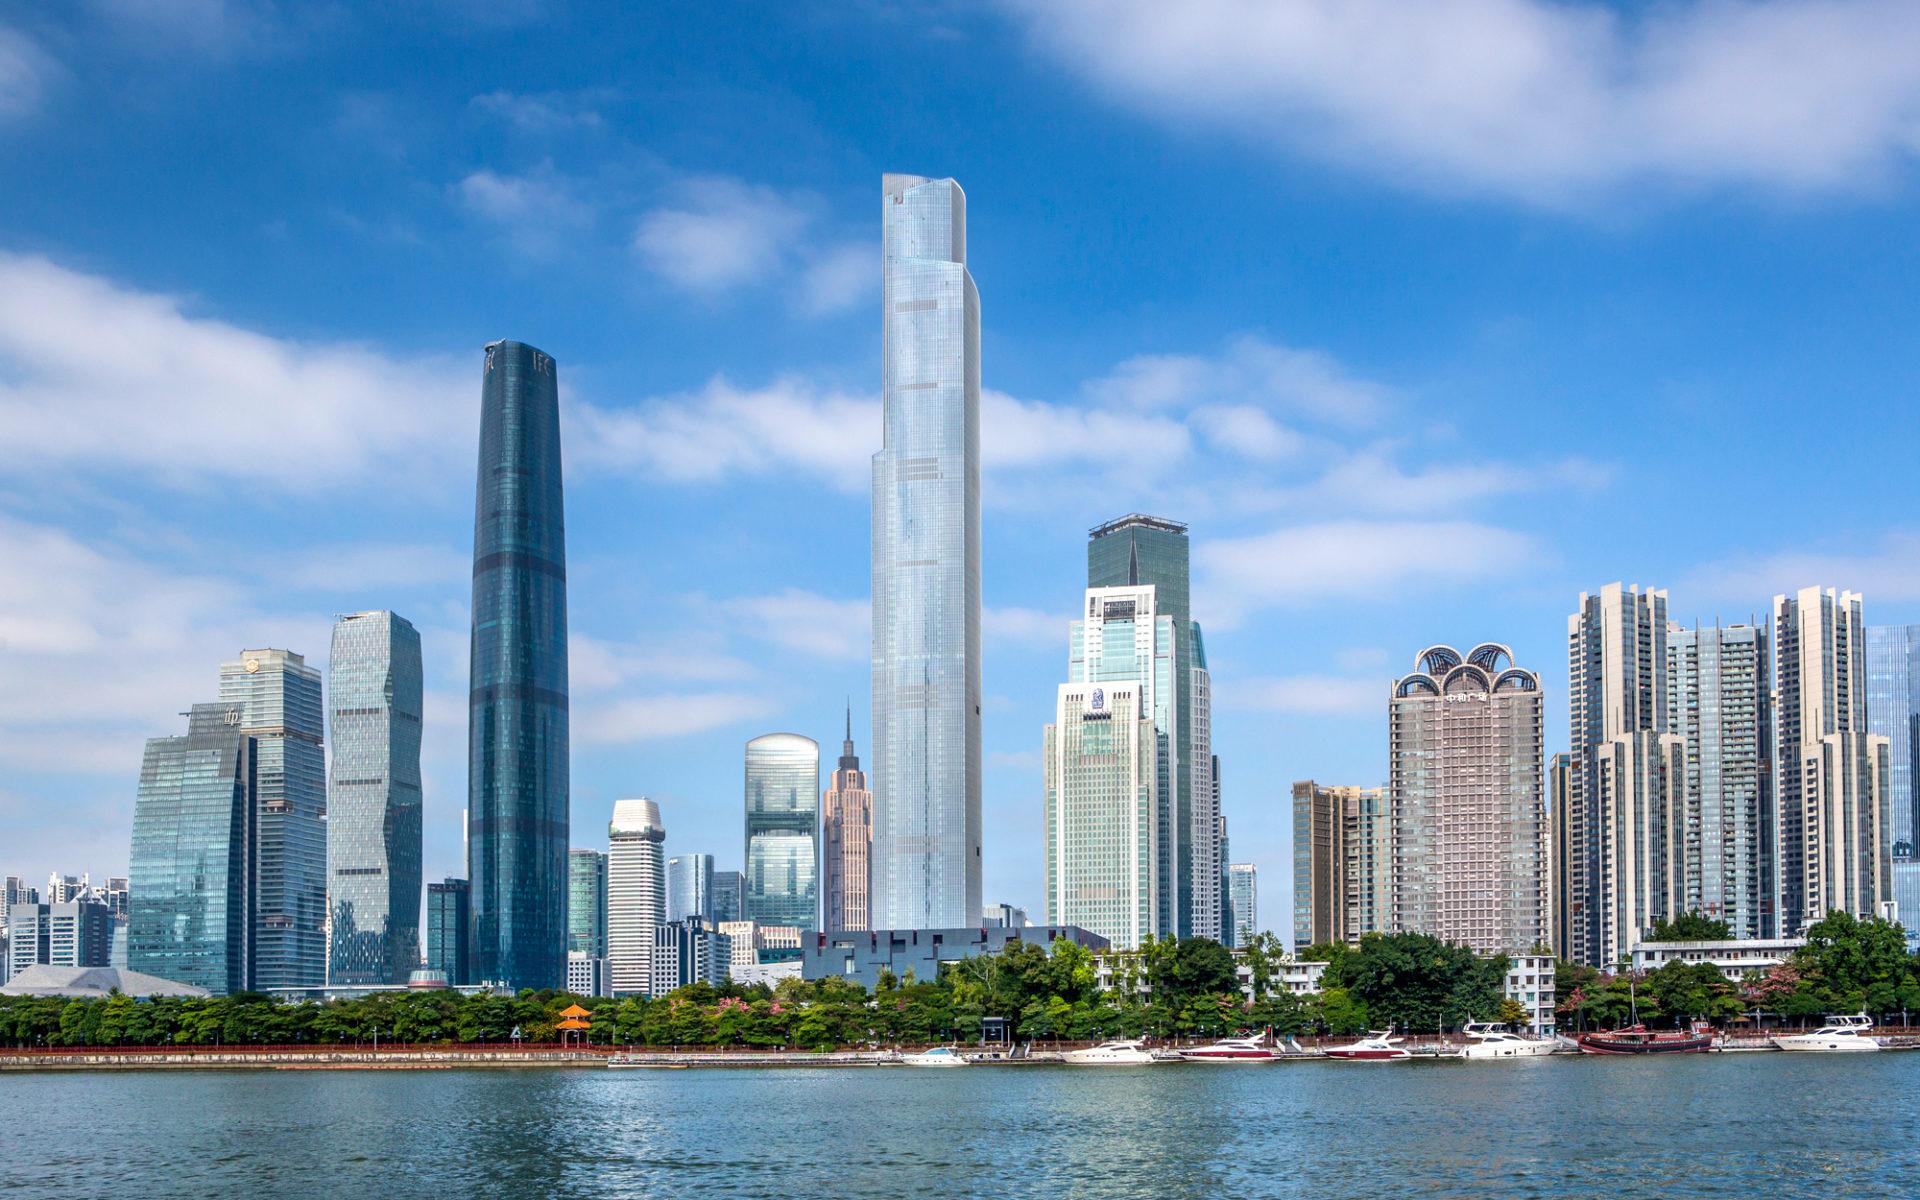 14. CTF Finance Centre (Гуанчжоу, Китай) – 530 метров.